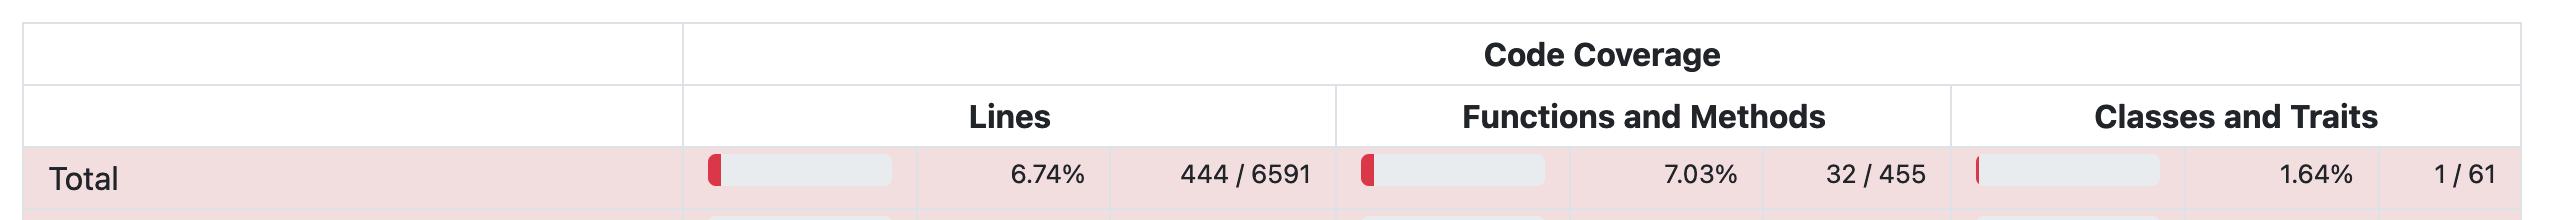 Screenshot 2021-08-02 at 23.02.49.png (220×2 px, 51 KB)